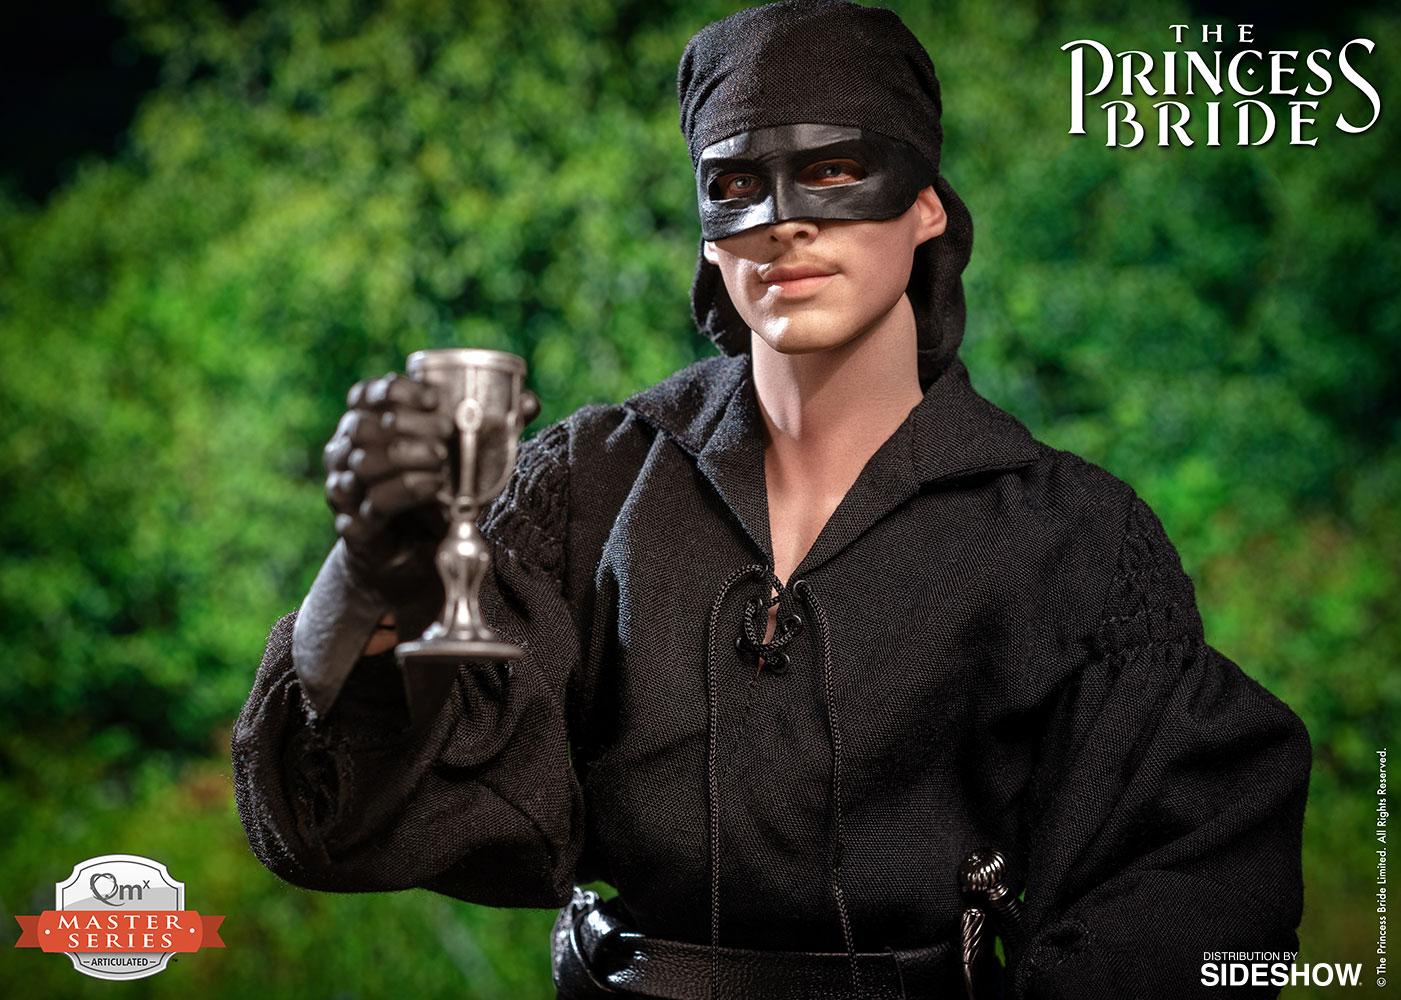 westley-aka-the-dread-pirate-roberts_the